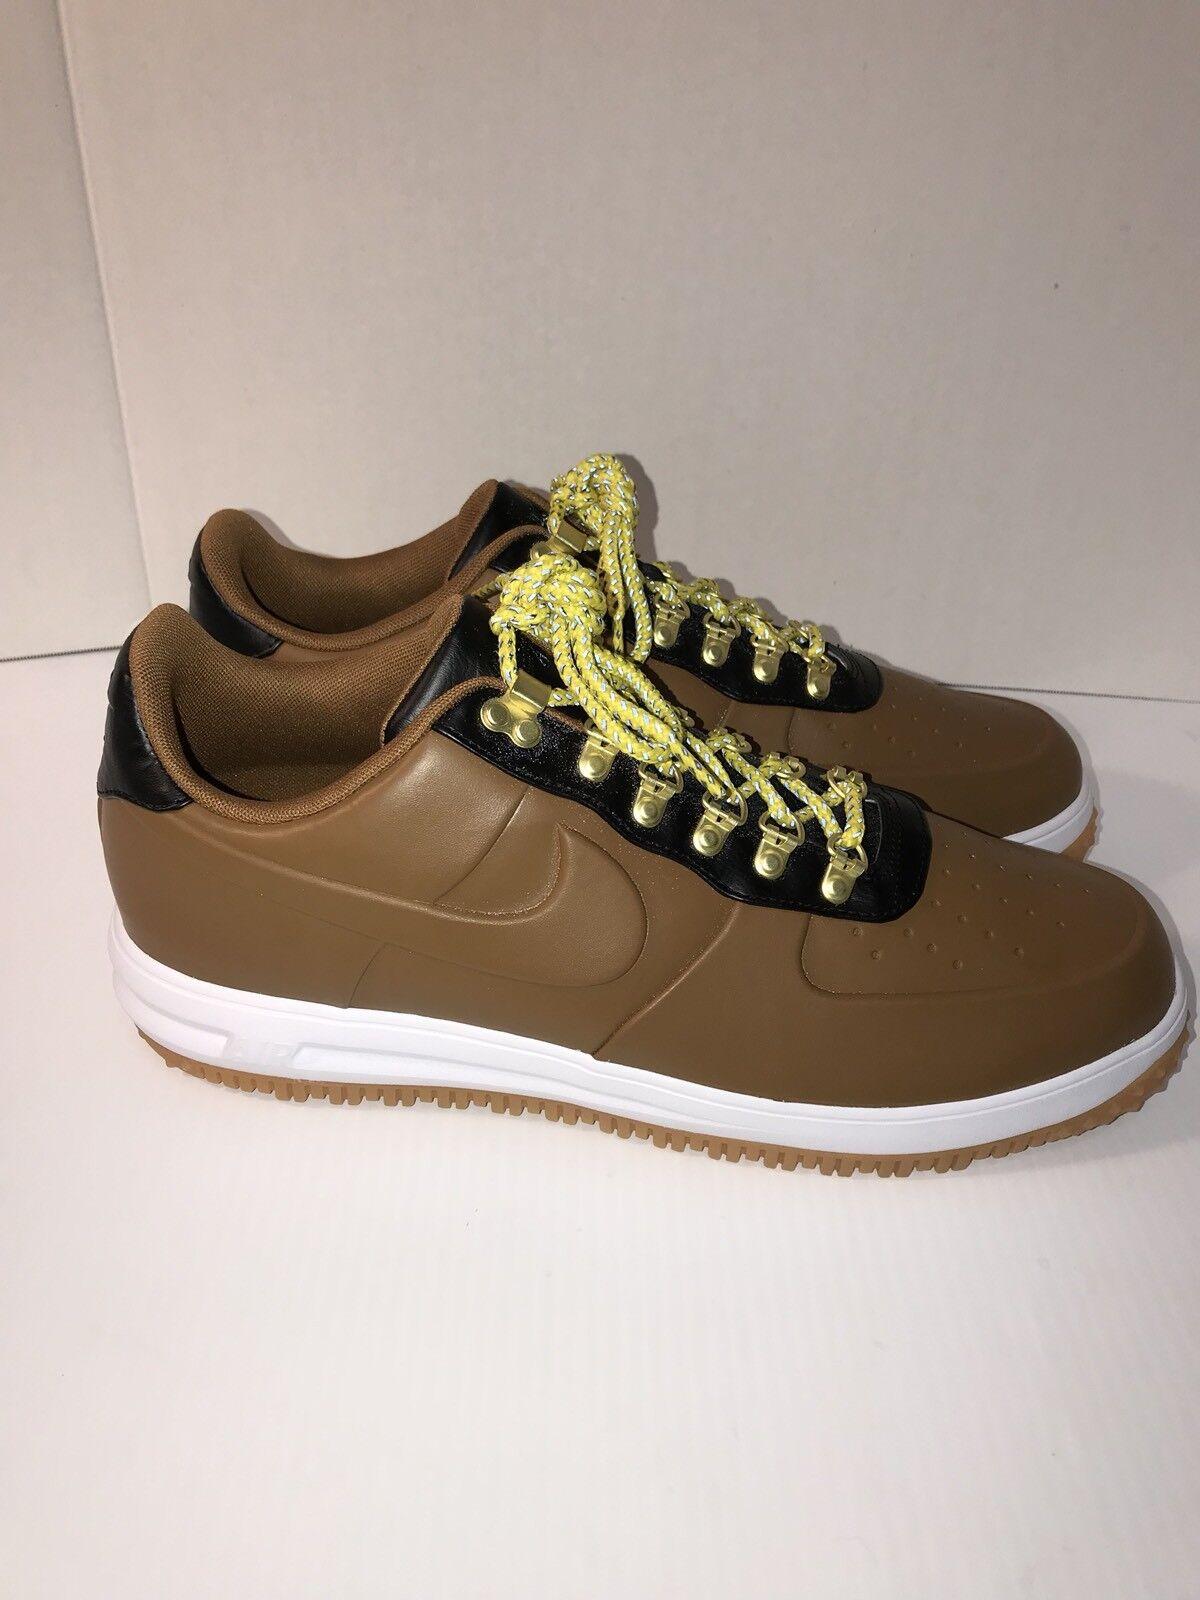 Mens Nike LF1 Duckboot Low  AA1125-200 Ale Brown Brand New Size 14